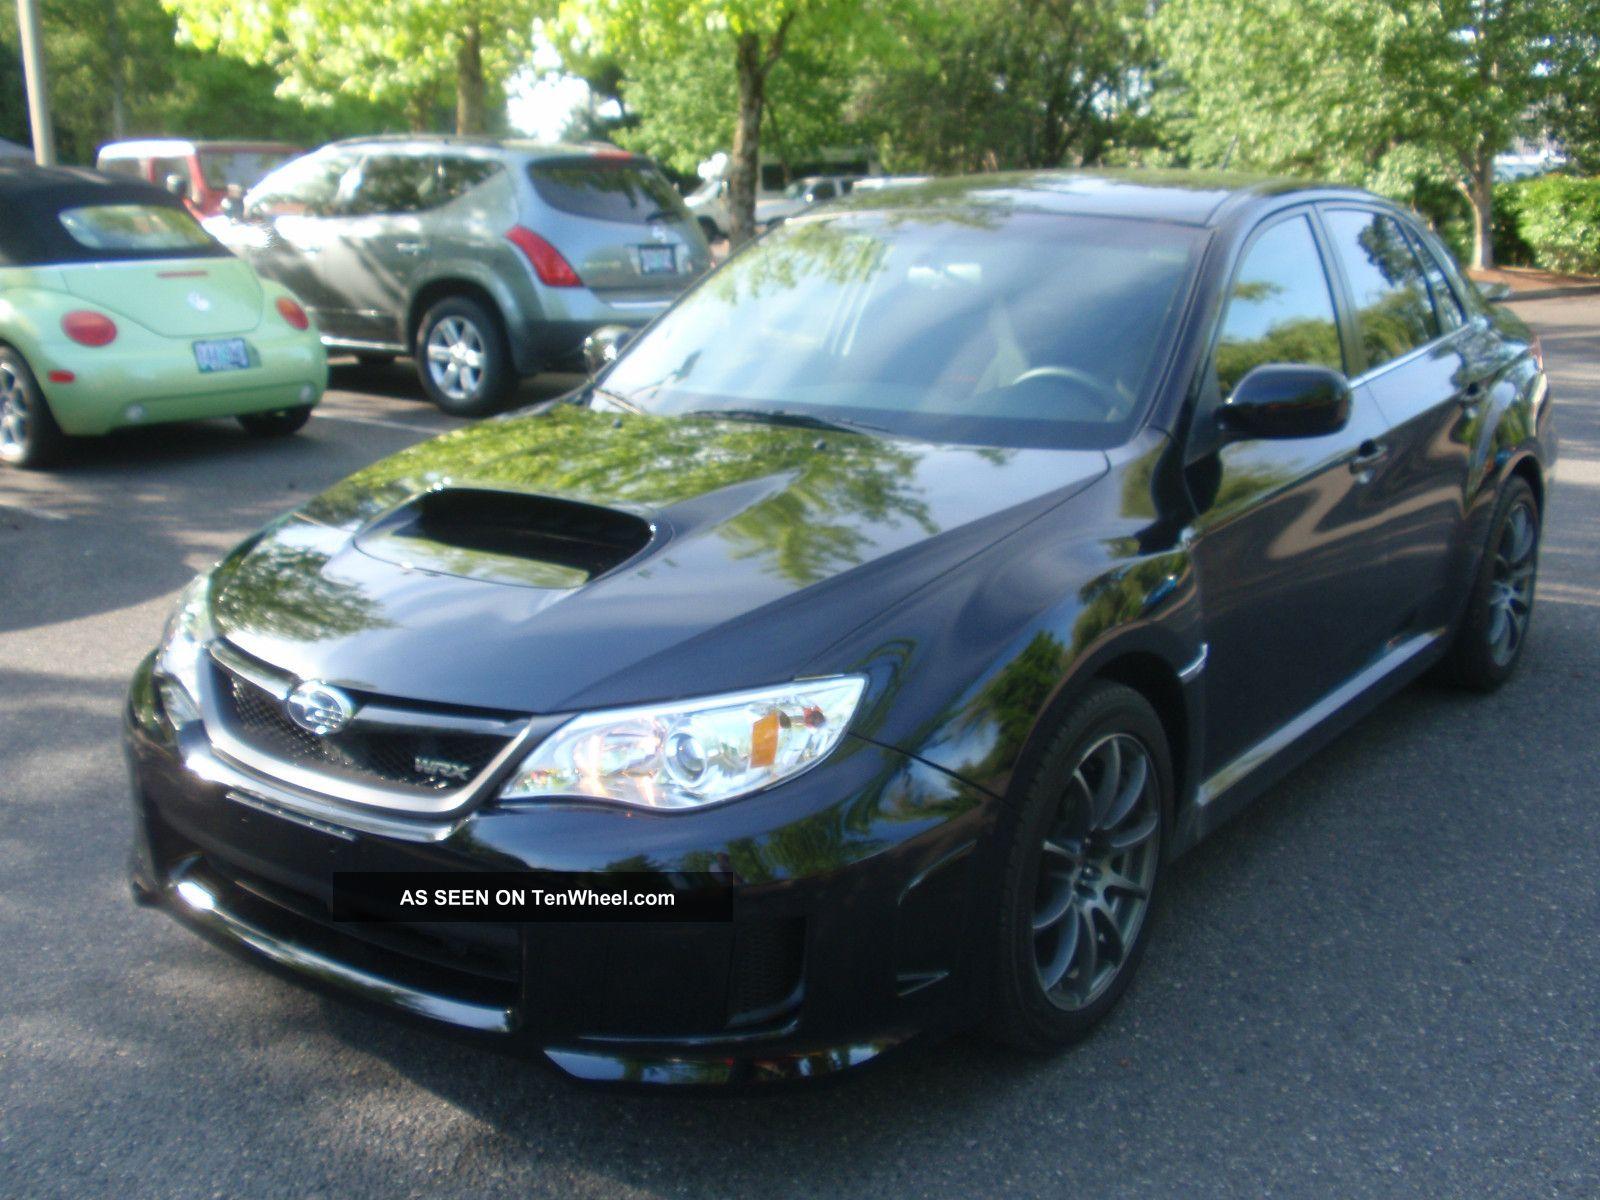 2012 Subaru Impreza Wrx Excellent Vehicle & Fast Save$$$ Impreza photo